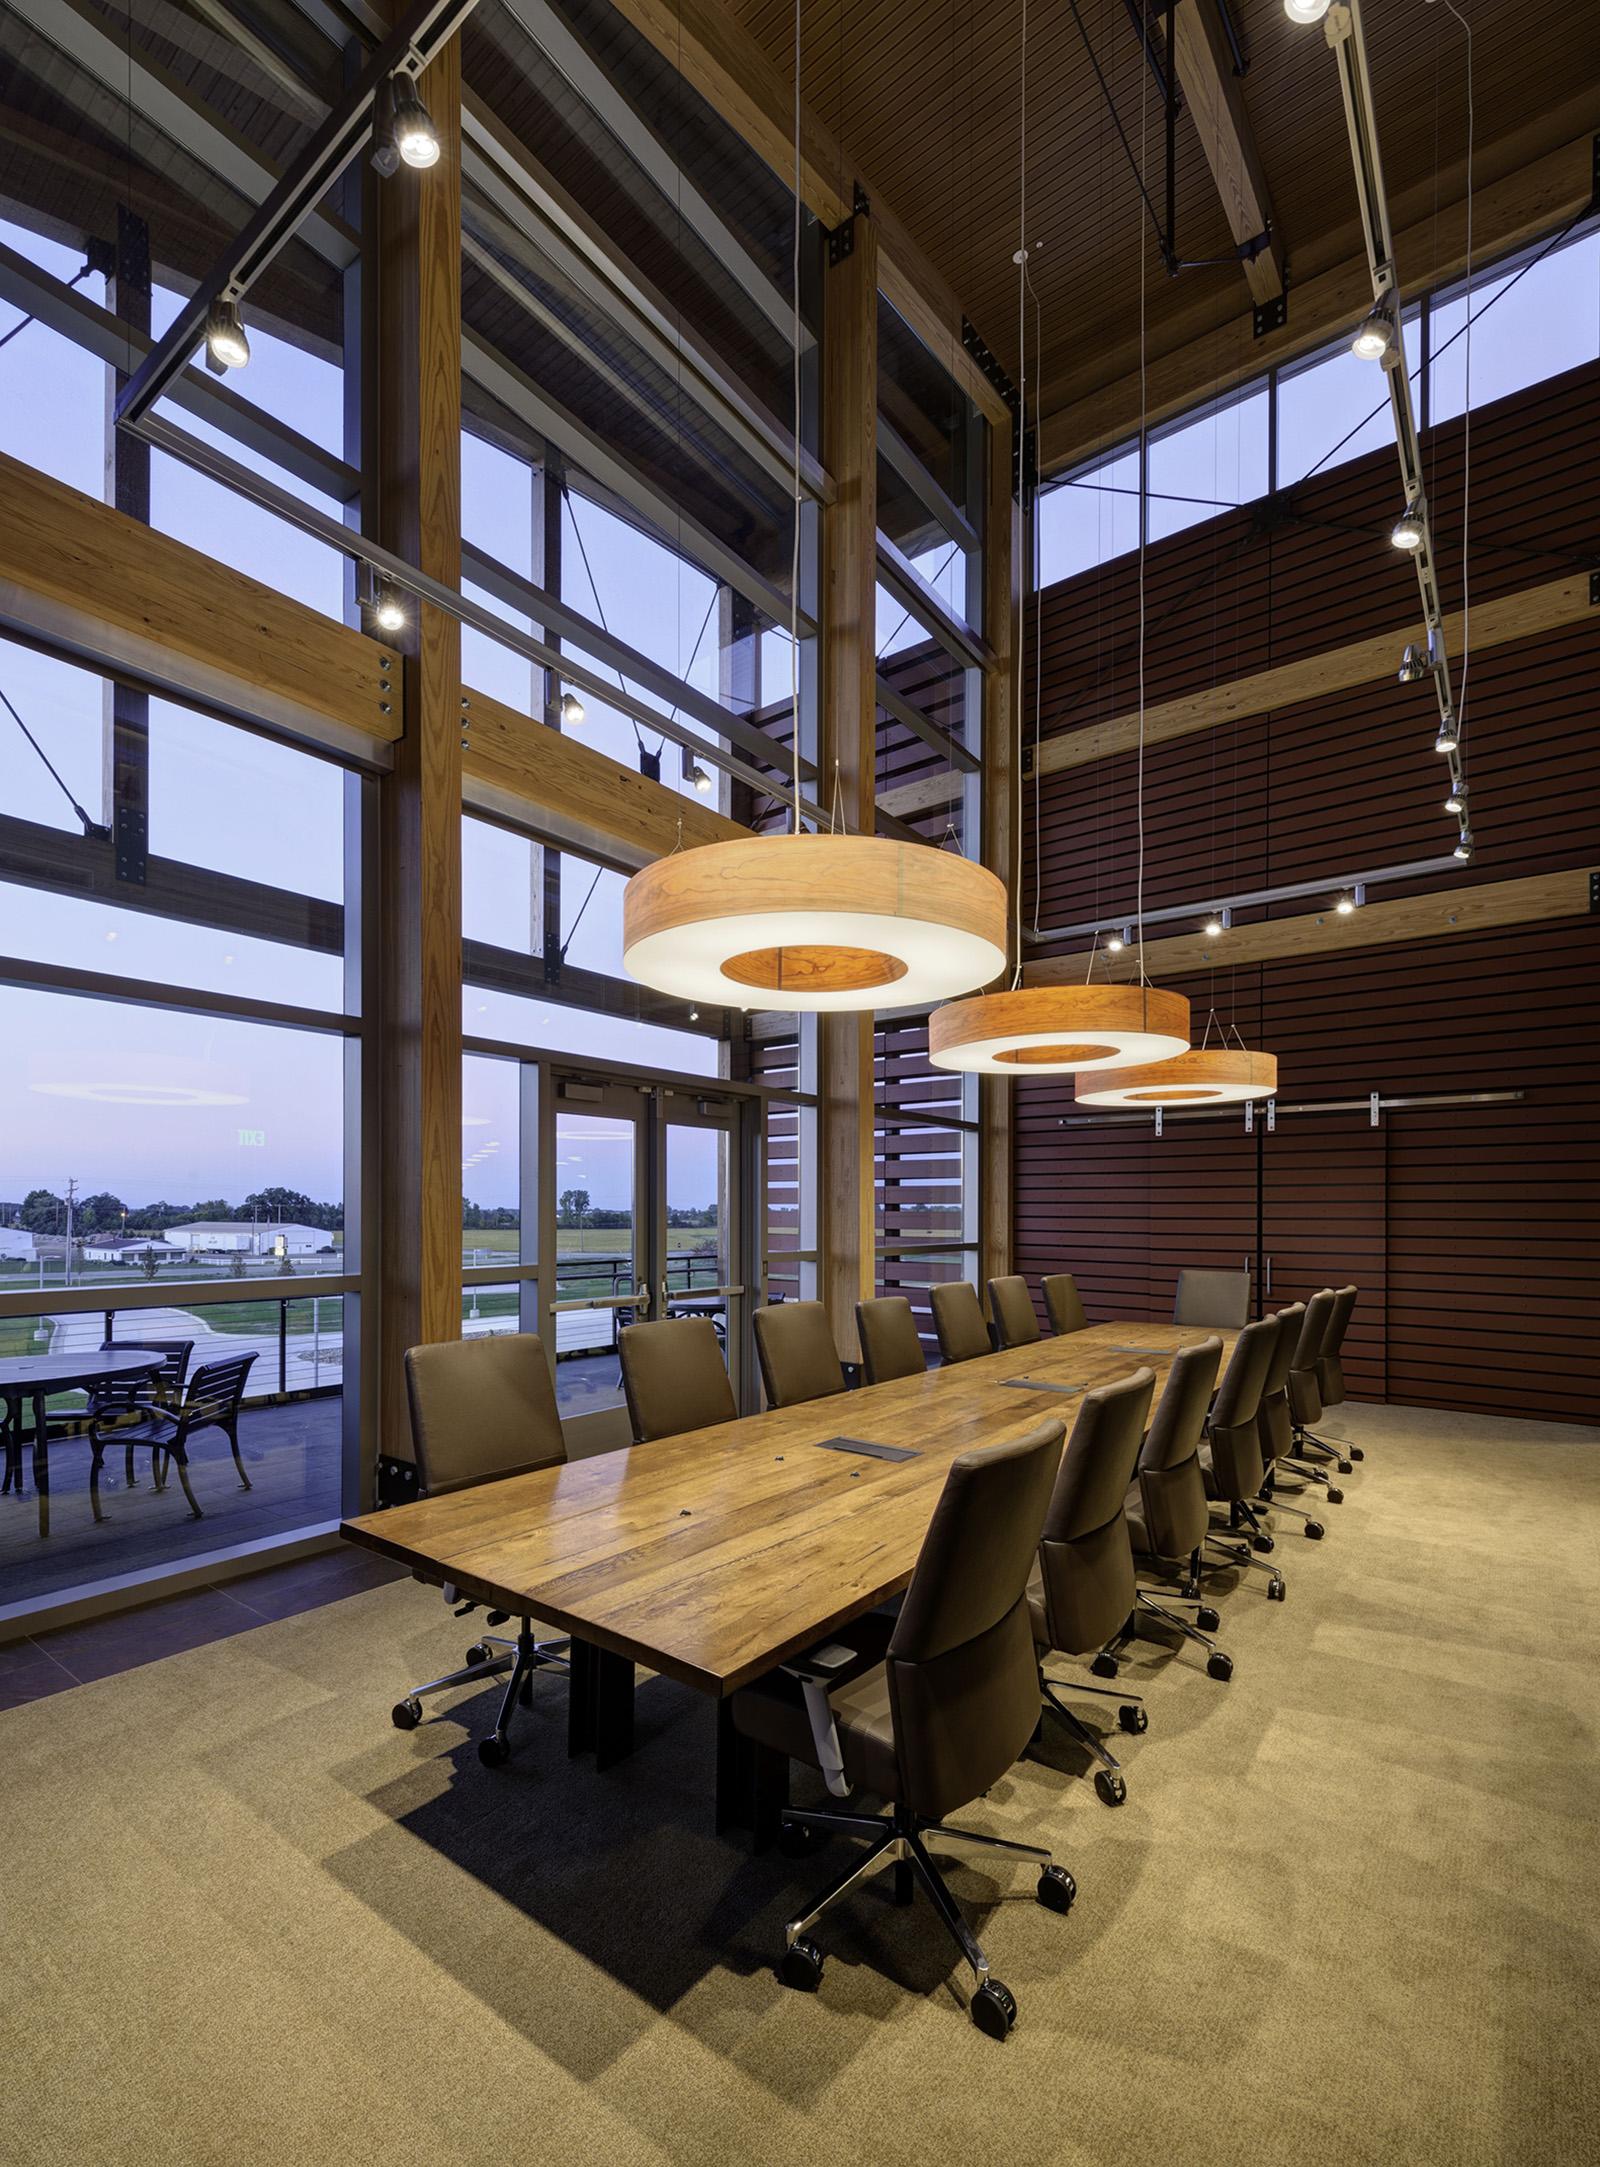 agro-culture-liquid-fertilizers-conference-room